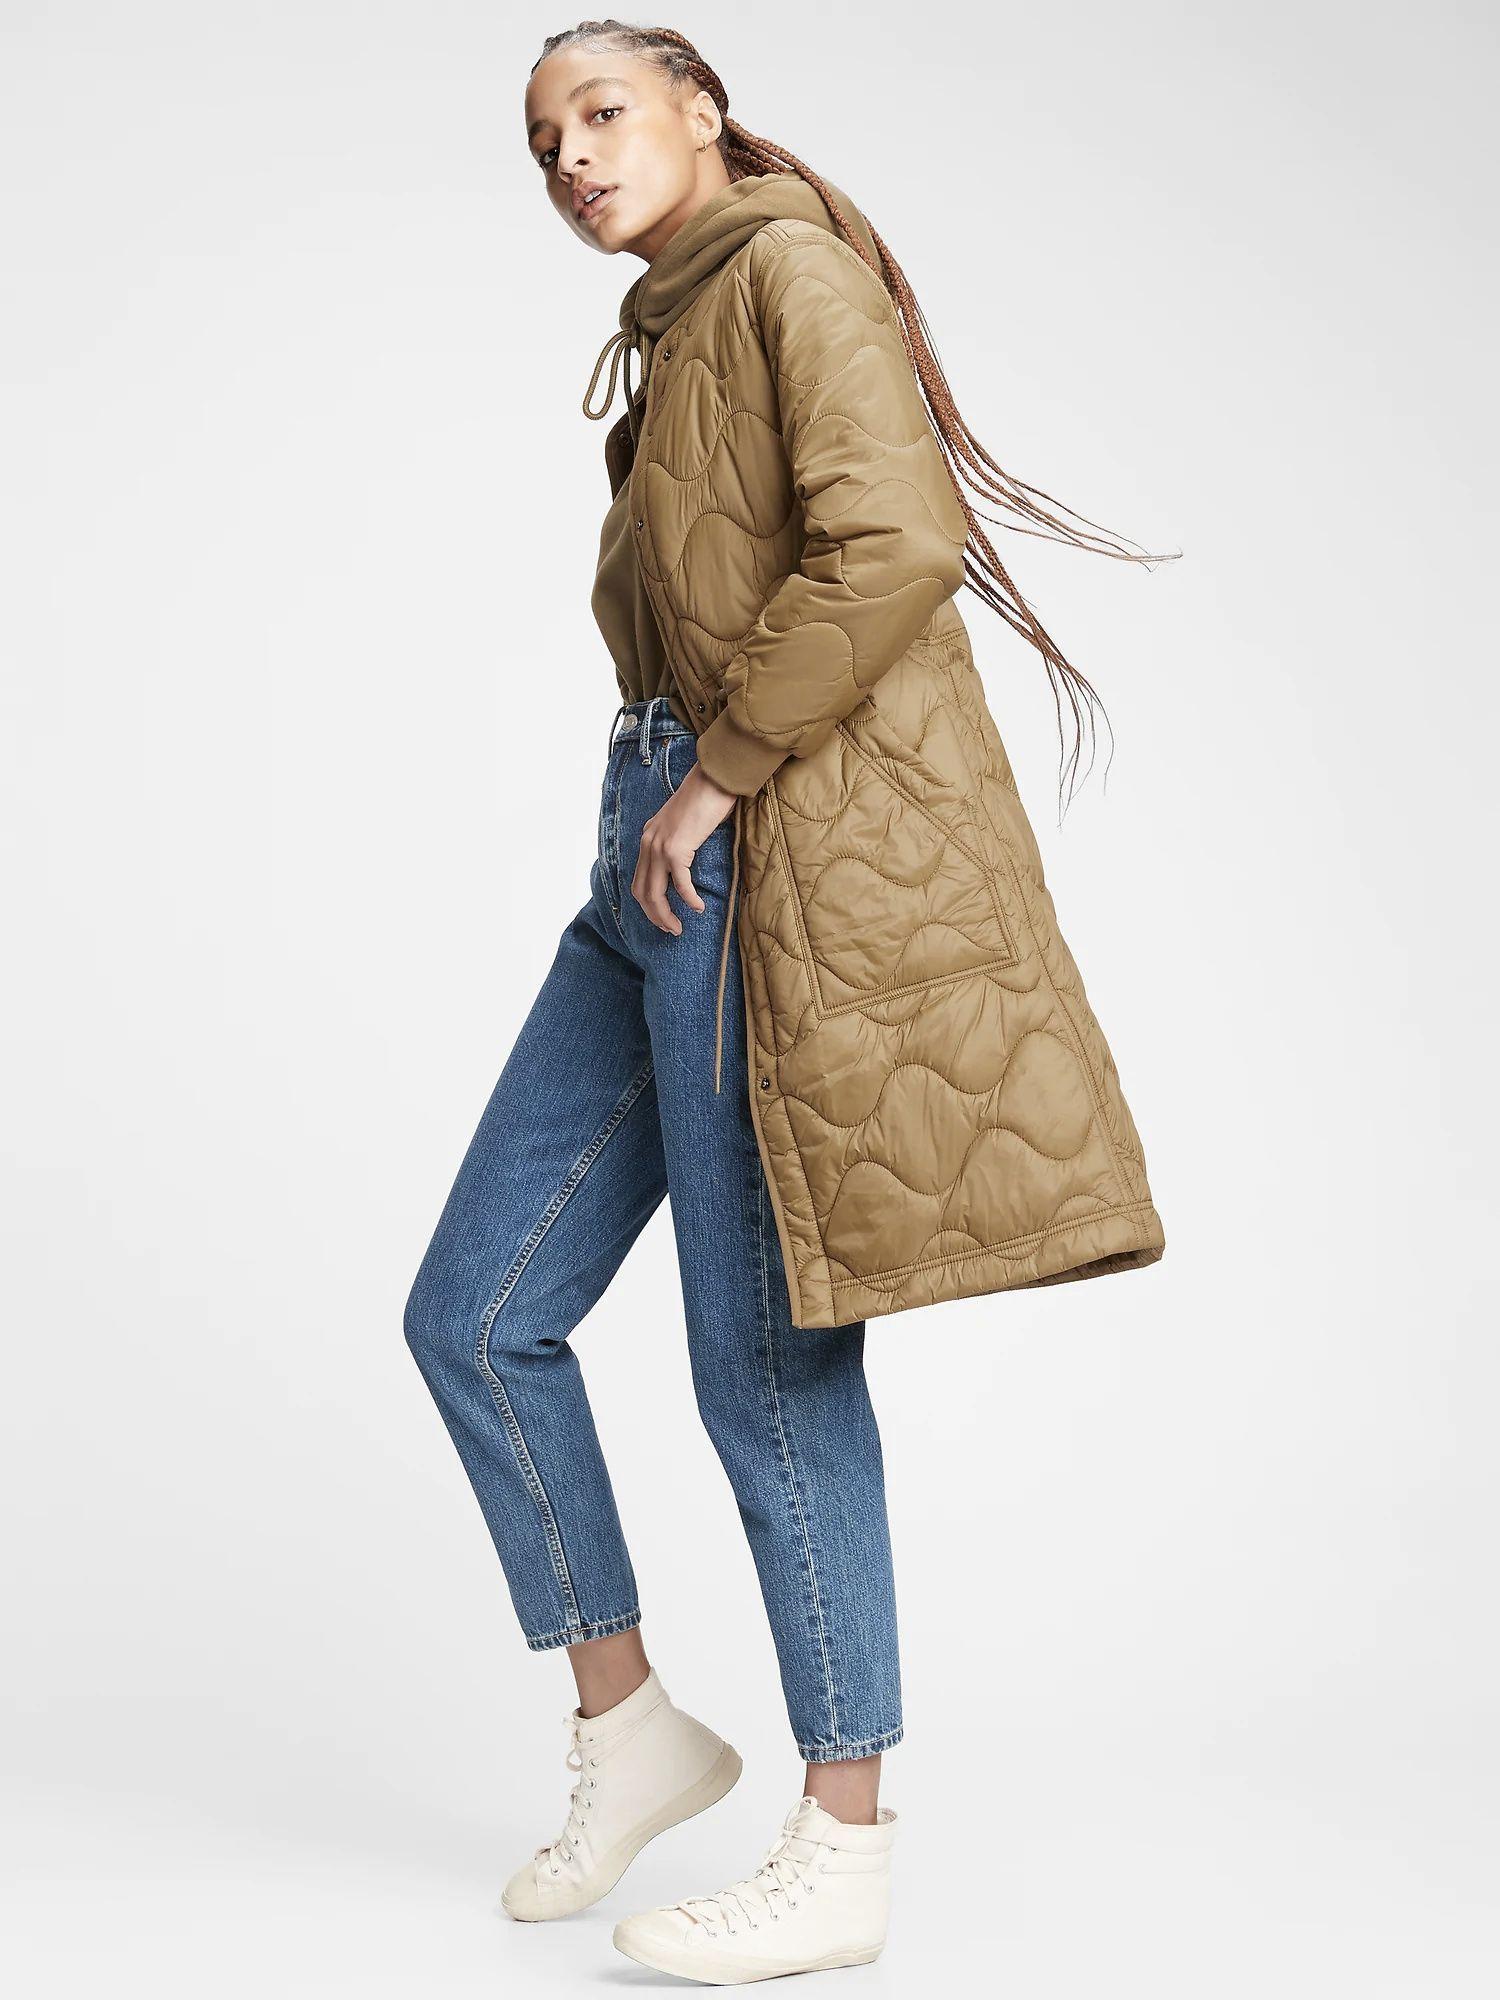 We Ve Fallen In Love With Grandma Coats Winter S Viral Fashion Trend Women S Puffer Coats Puffer Coat Long Puffer Coat Street Style [ 2000 x 1500 Pixel ]